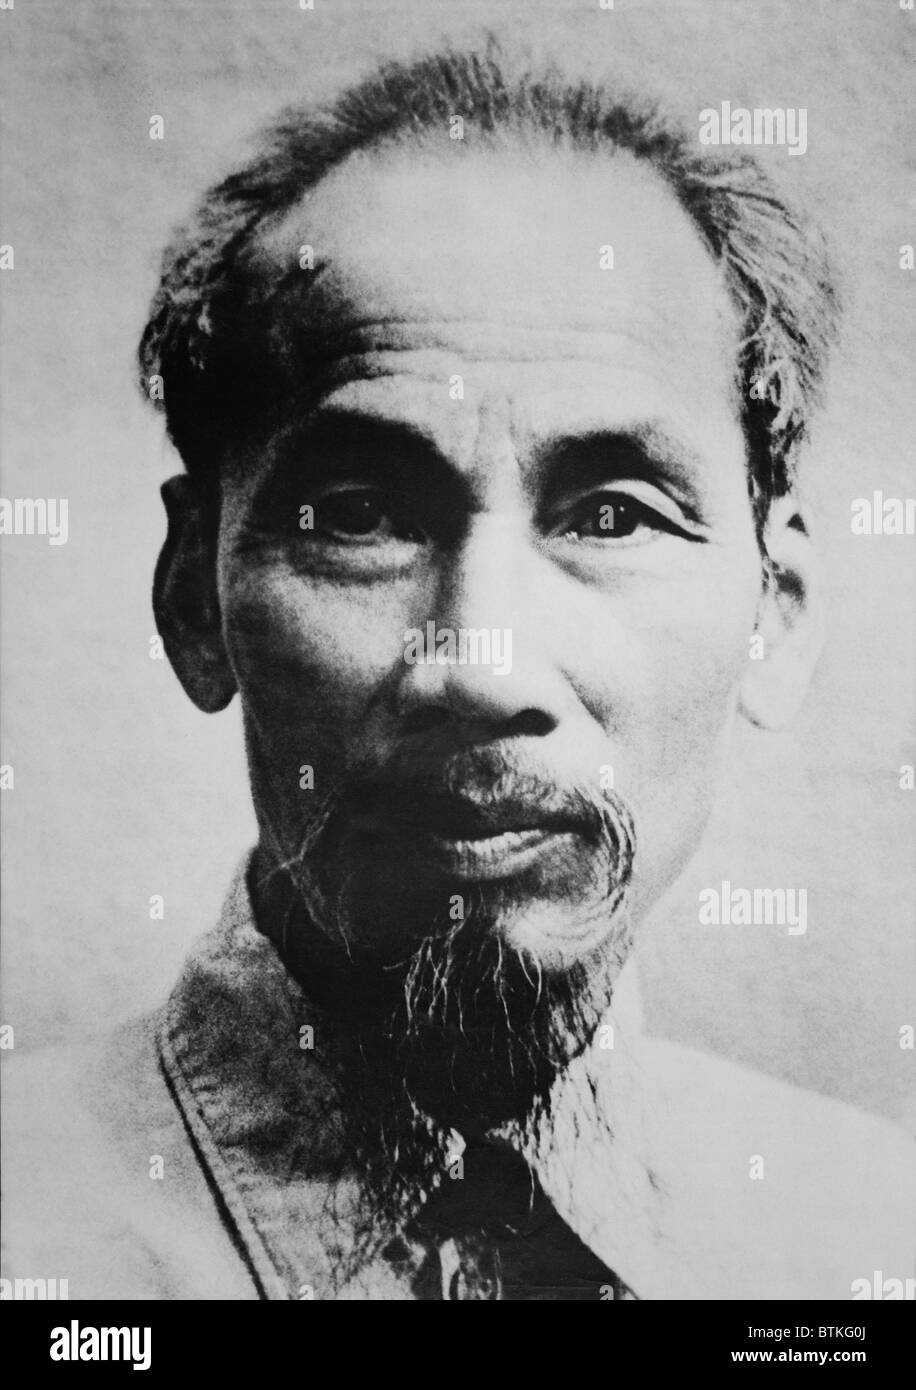 Ho Chi Minh (1890-1969), Vietnamese patriot, communist, and anti-colonialist revolutionary. - Stock Image